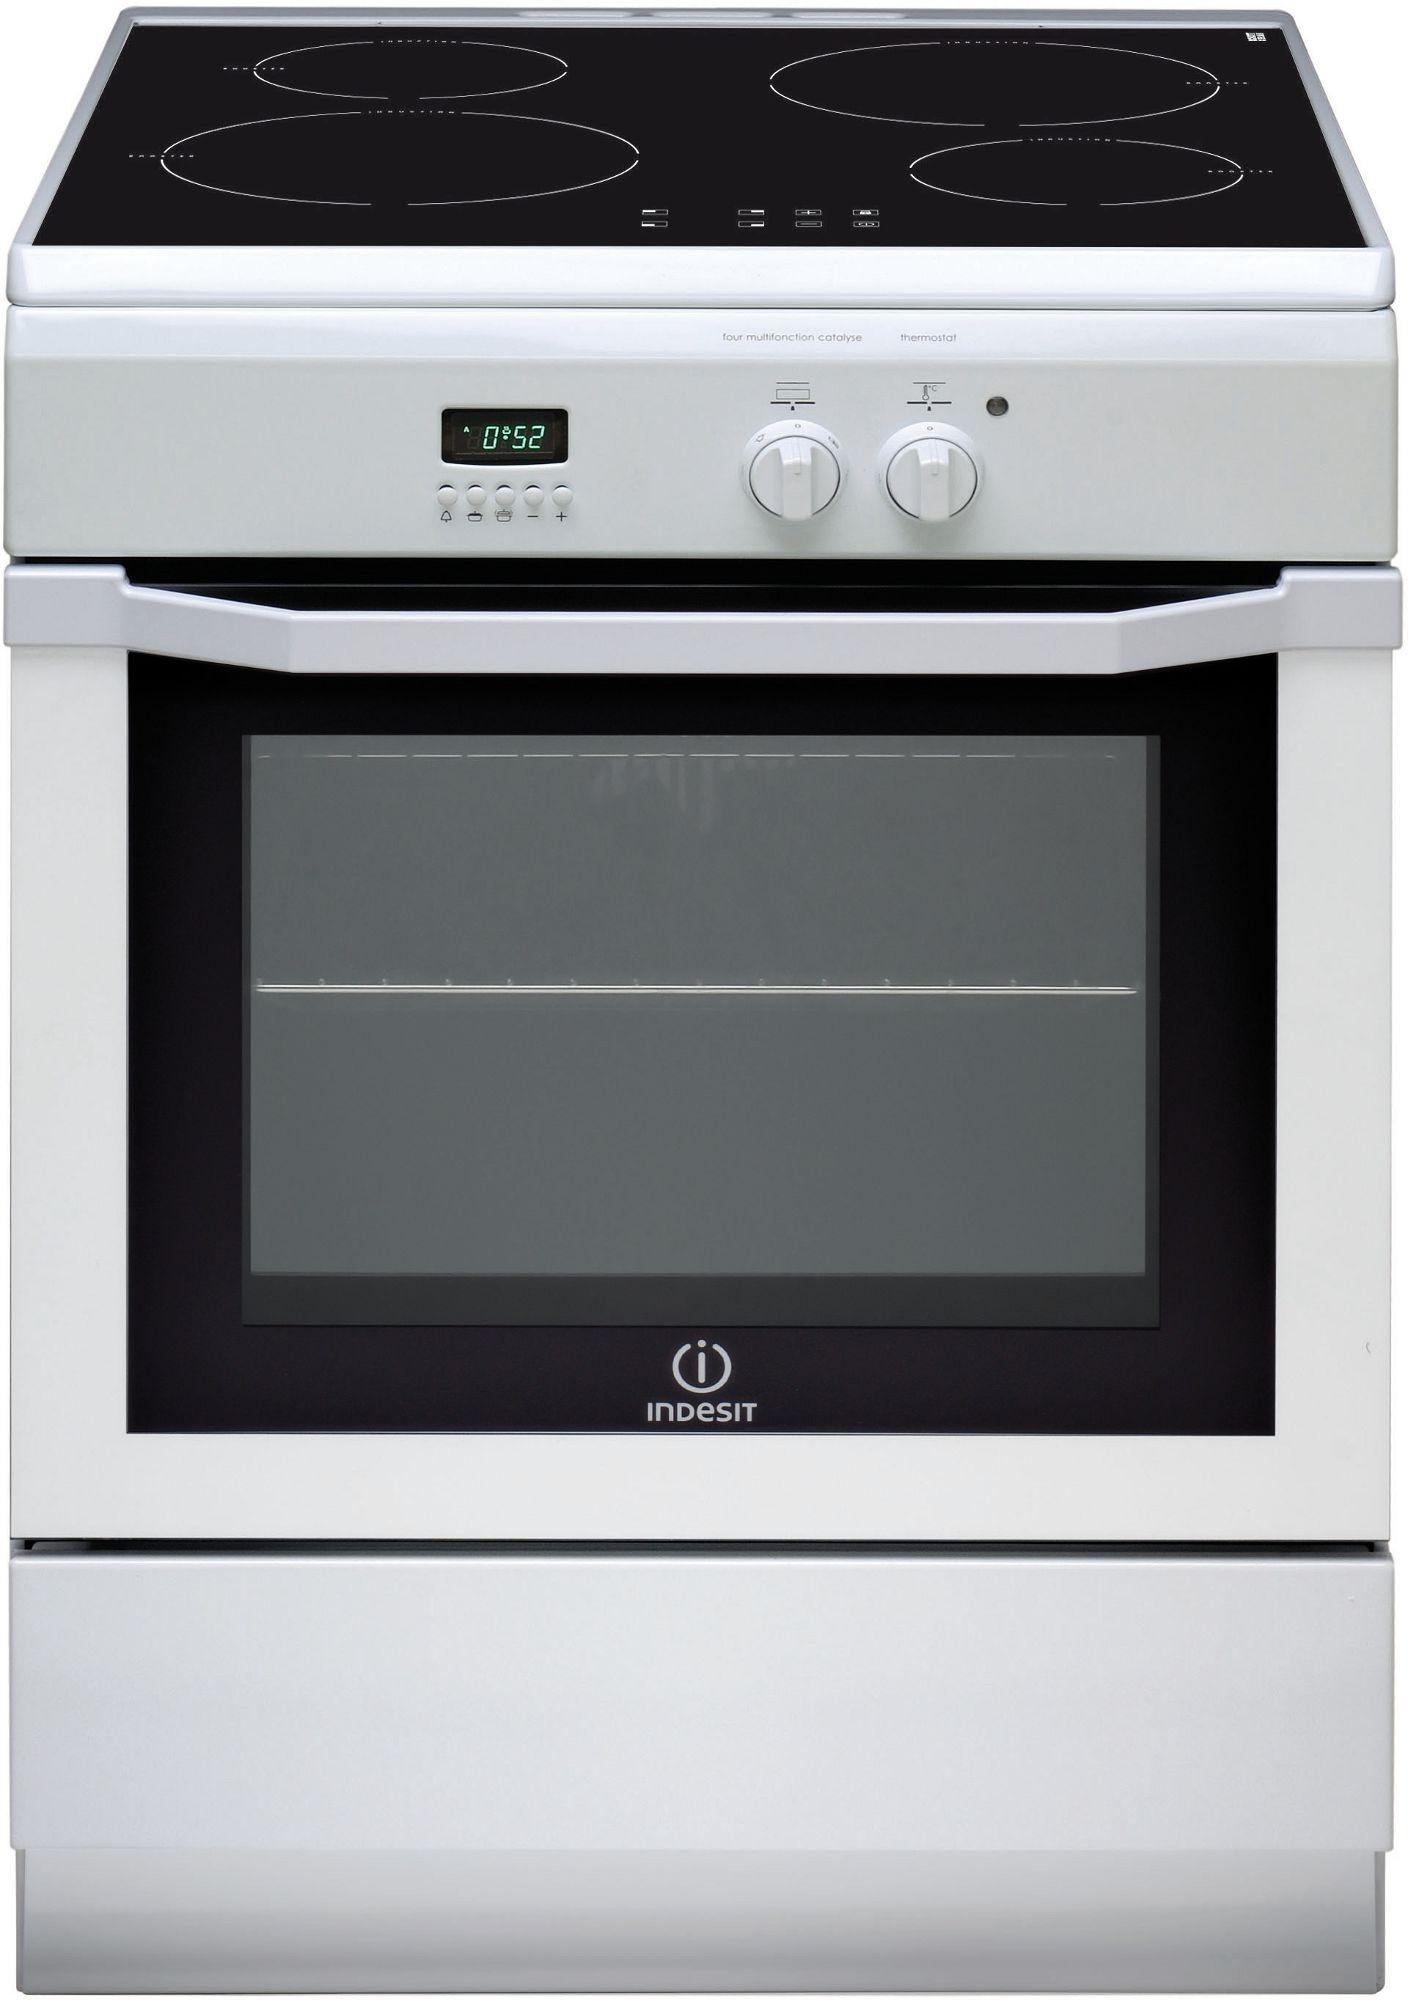 cuisini re induction indesit couleur blanc 59 litres 4 foyers stl sarl materiels. Black Bedroom Furniture Sets. Home Design Ideas